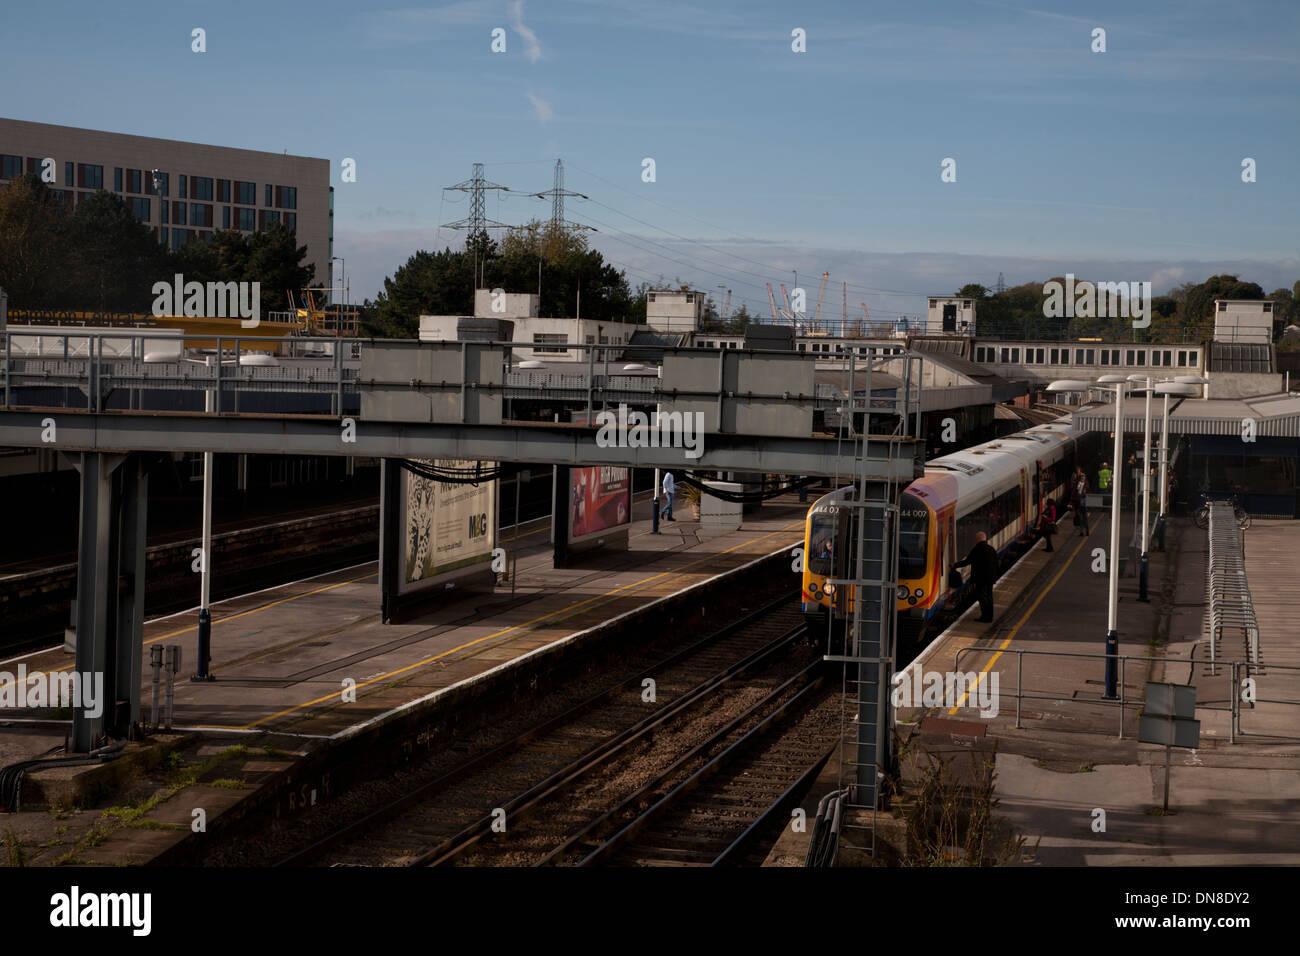 southampton central station southampton hampshire england - Stock Image